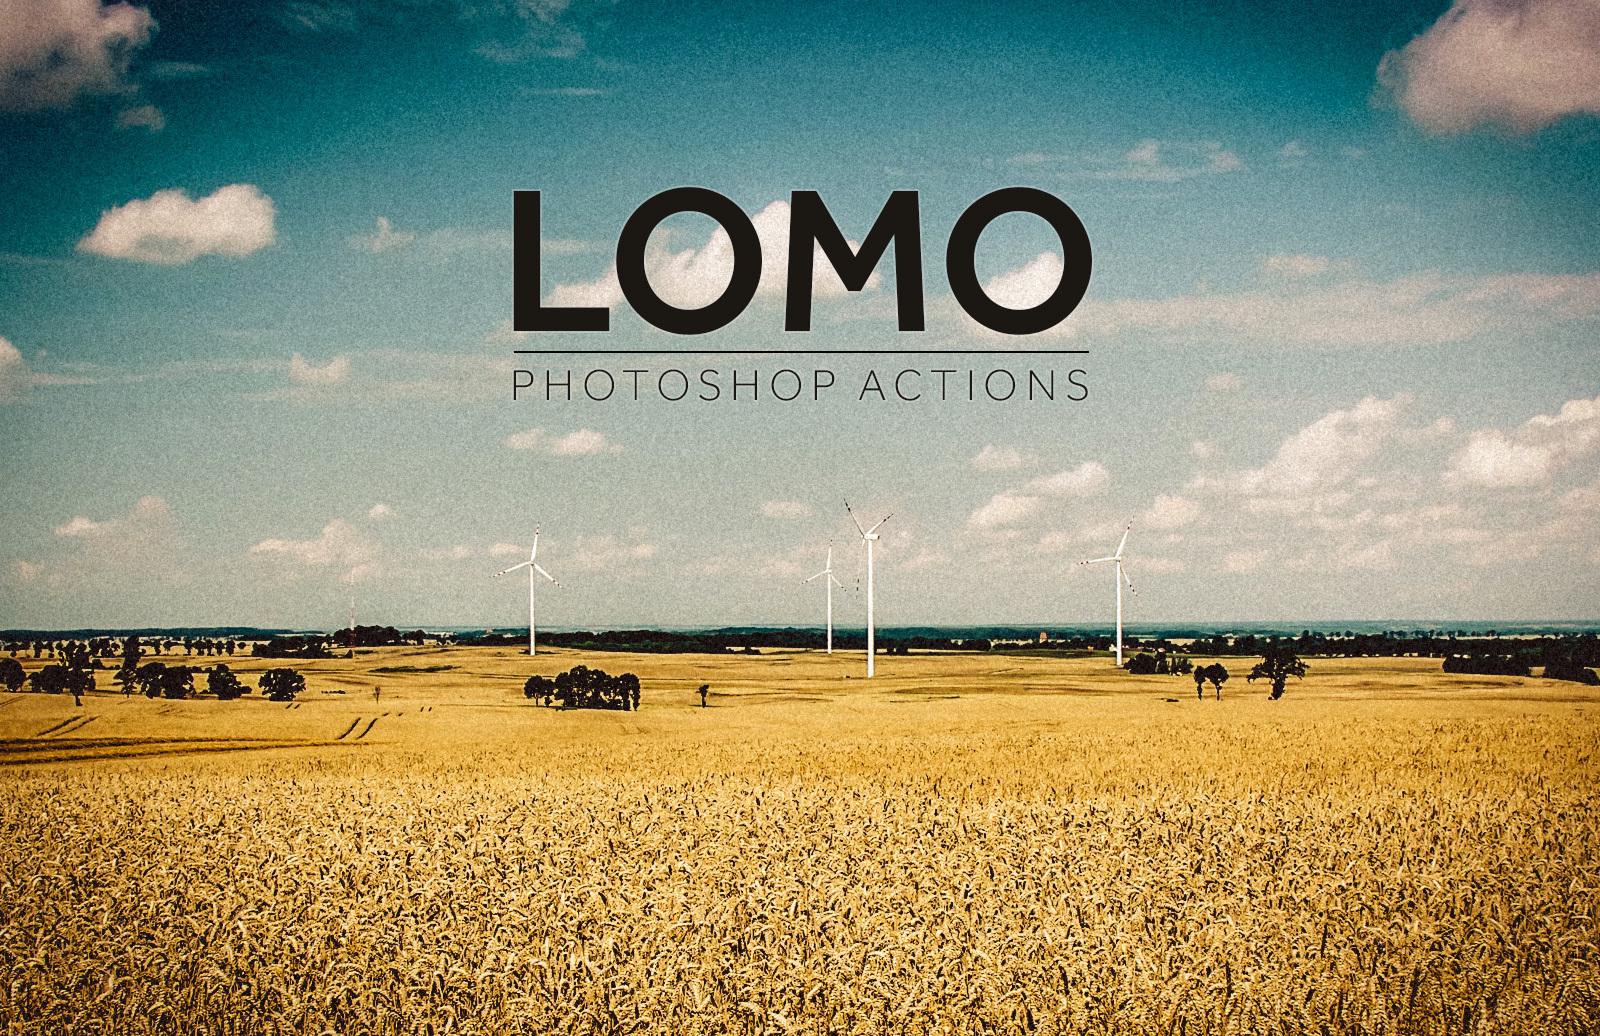 Lomo Photoshop Action 1